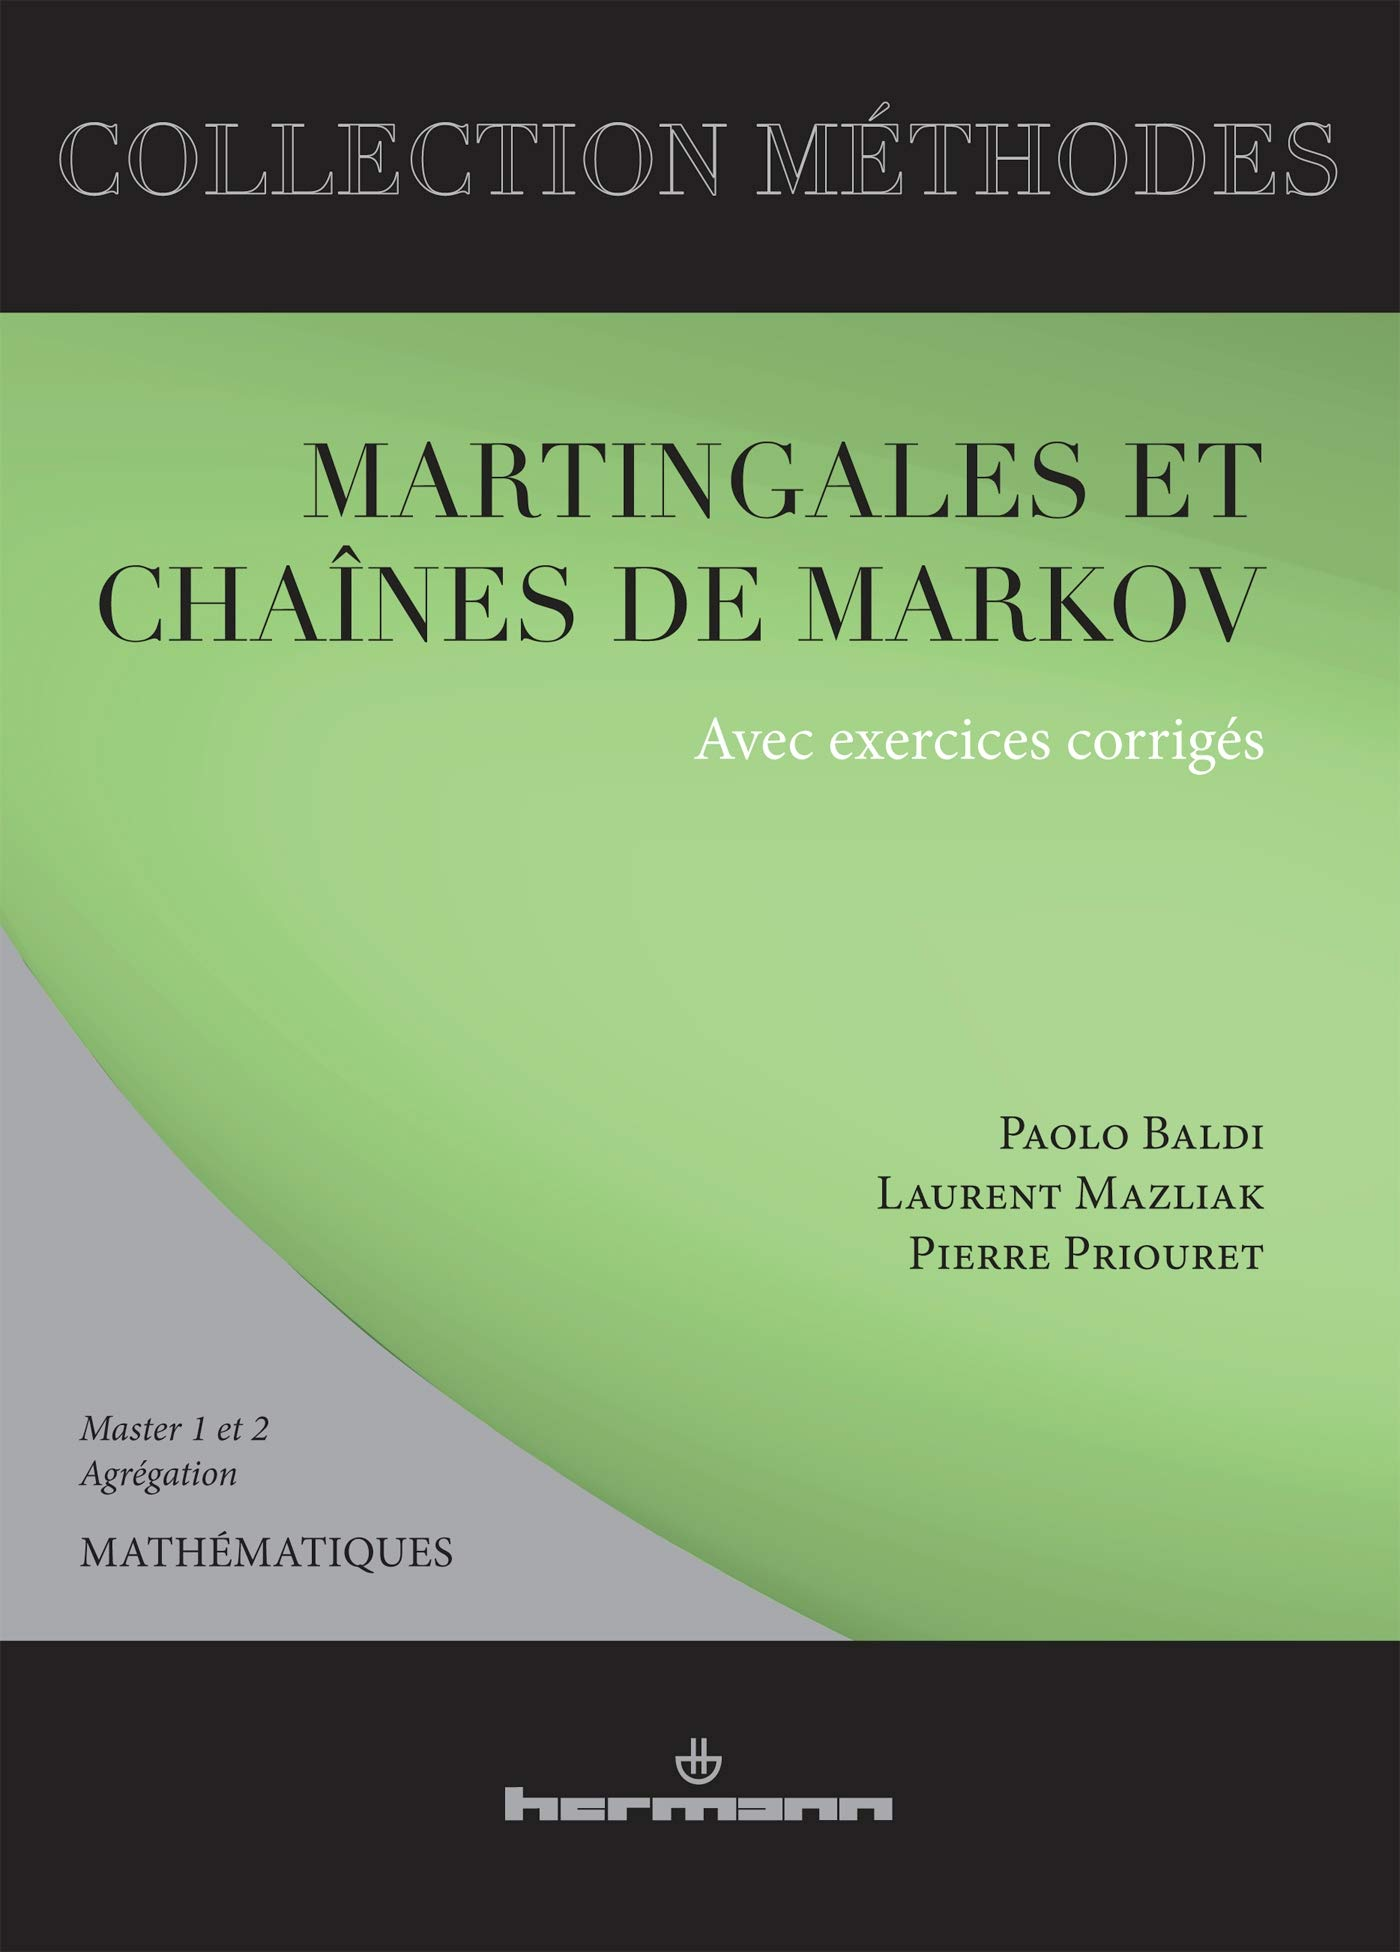 Chaine de markov et martingale betting dota 2 betting subreddit drama